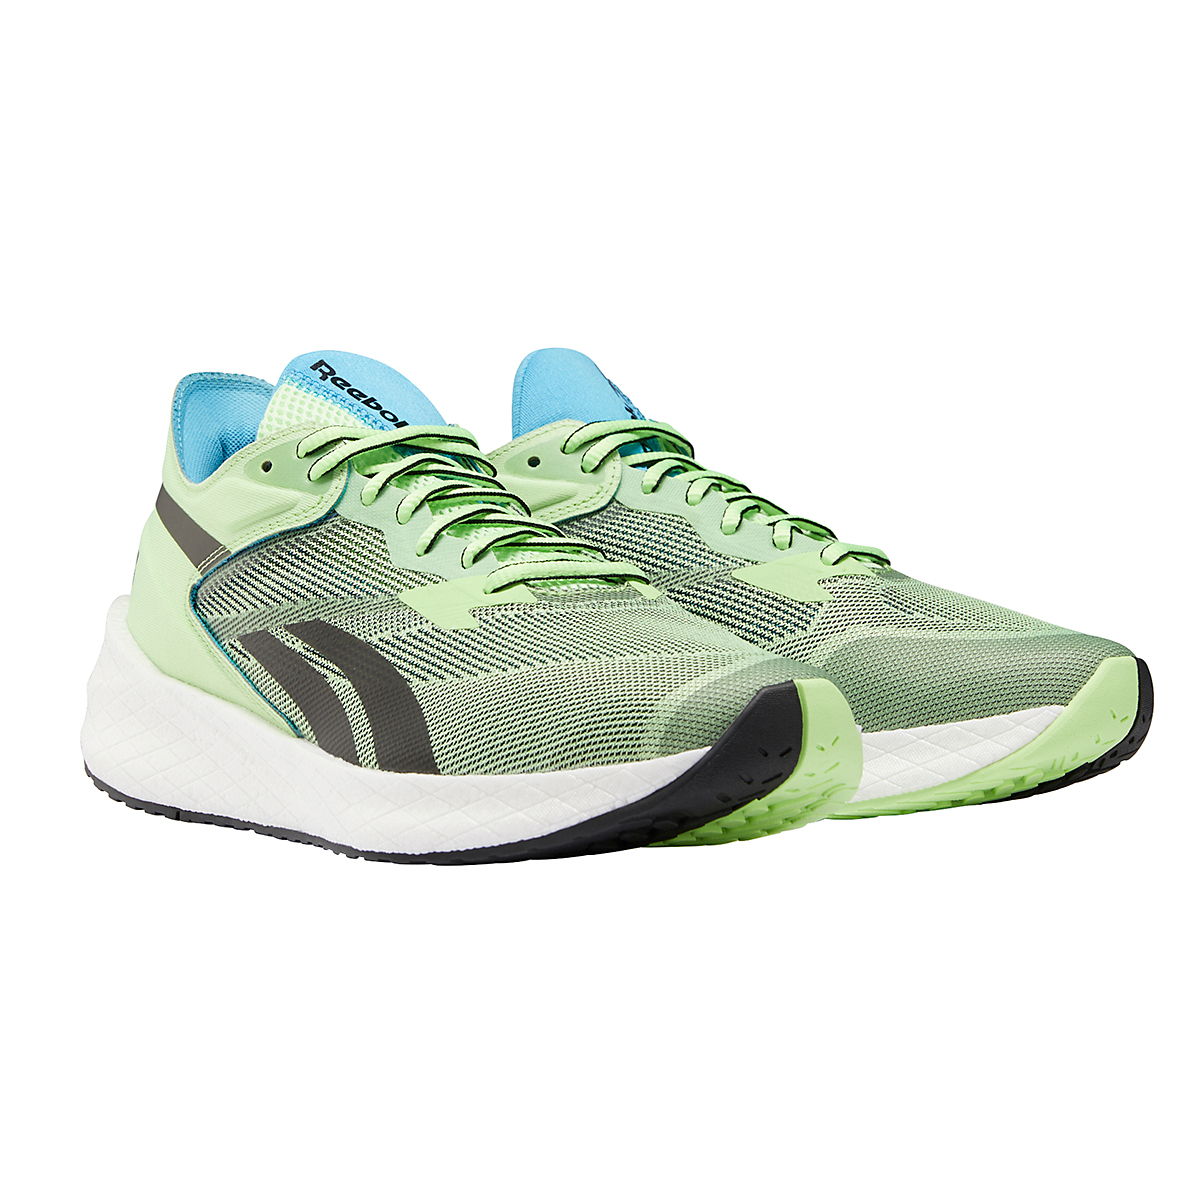 Men's Reebok Floatride Energy Symmetros Running Shoe - Color: Neon Mint/Core Black/White - Size: 7 - Width: Regular, Neon Mint/Core Black/White, large, image 4